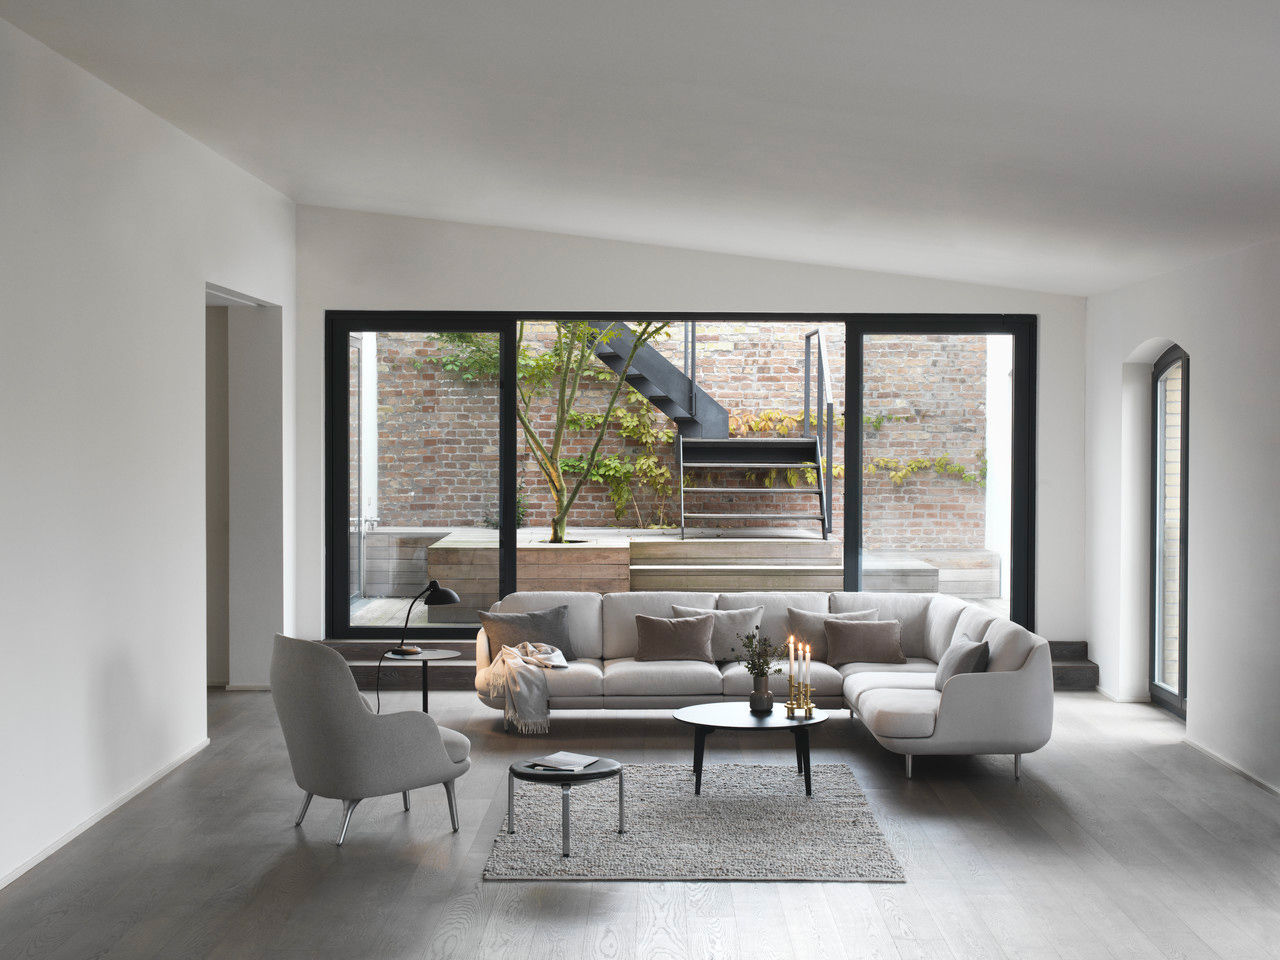 Fritz Hansen Introduces Lune – A Sofa by Jaime Hayon